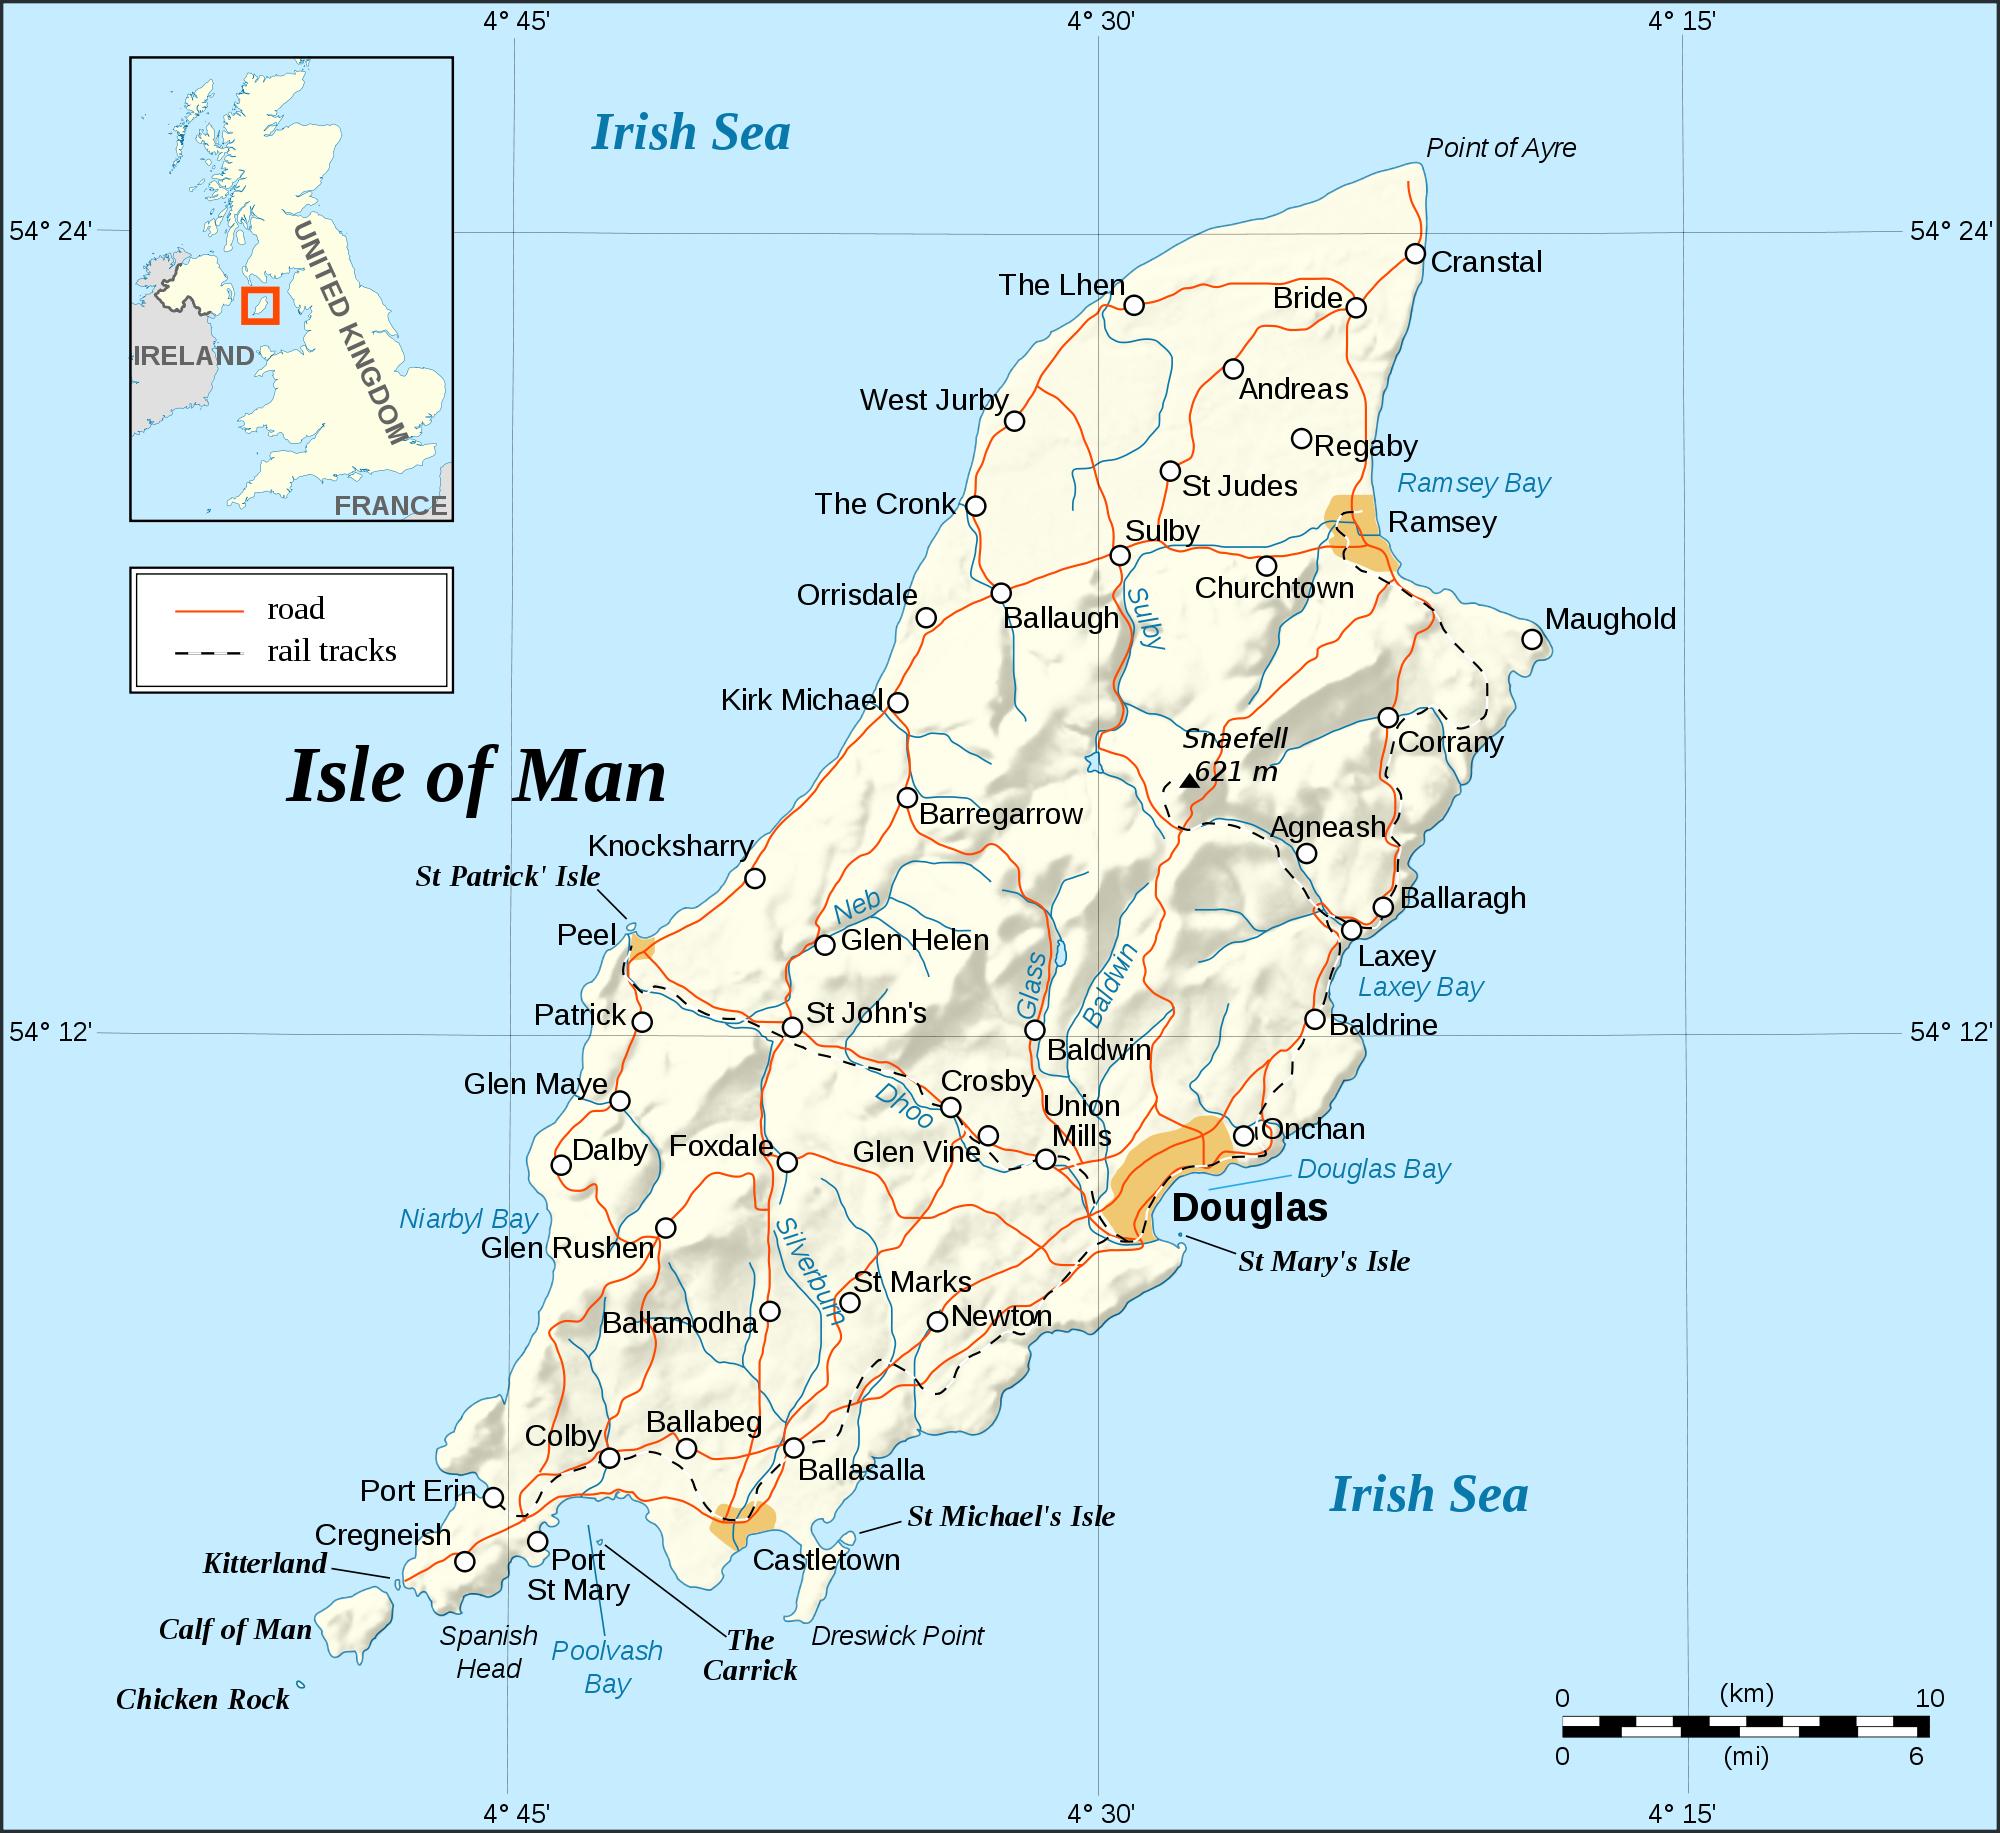 Isle of Man a selfgoverning British Crown dependency in the Irish